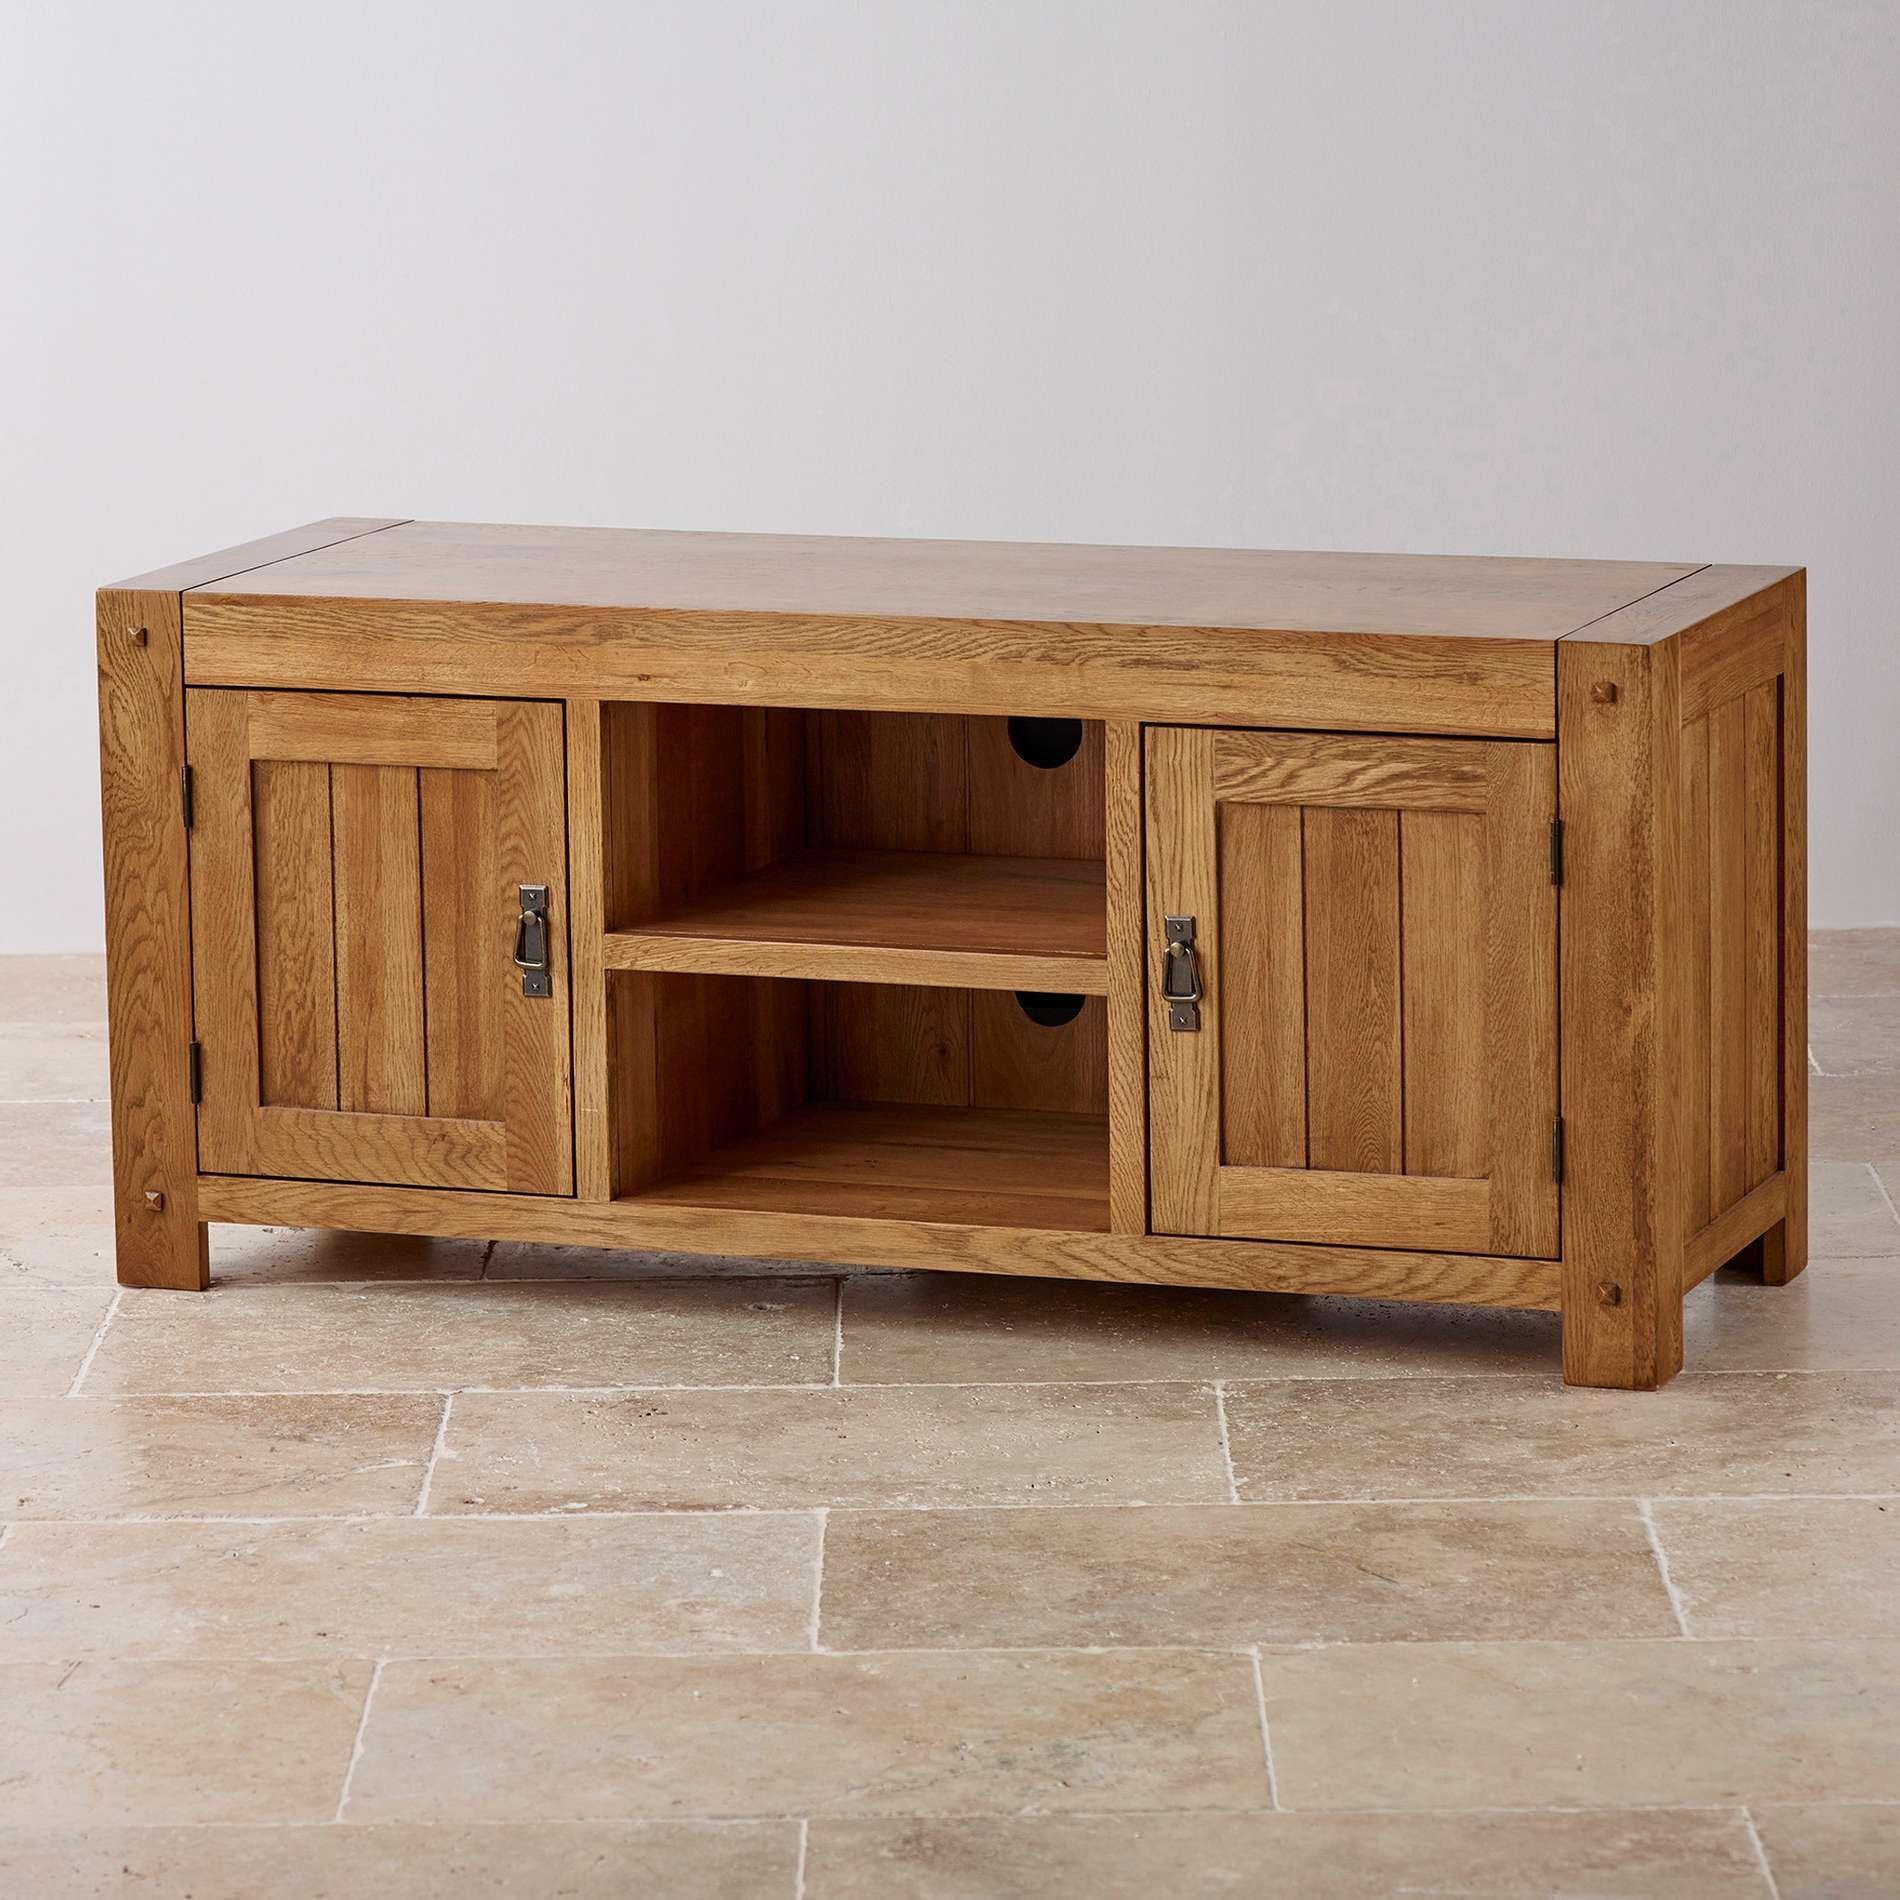 Tv Cabinets | Mango, Painted & Oak Tv Units | Oak Furniture Land With Regard To Mango Wood Tv Cabinets (View 18 of 20)